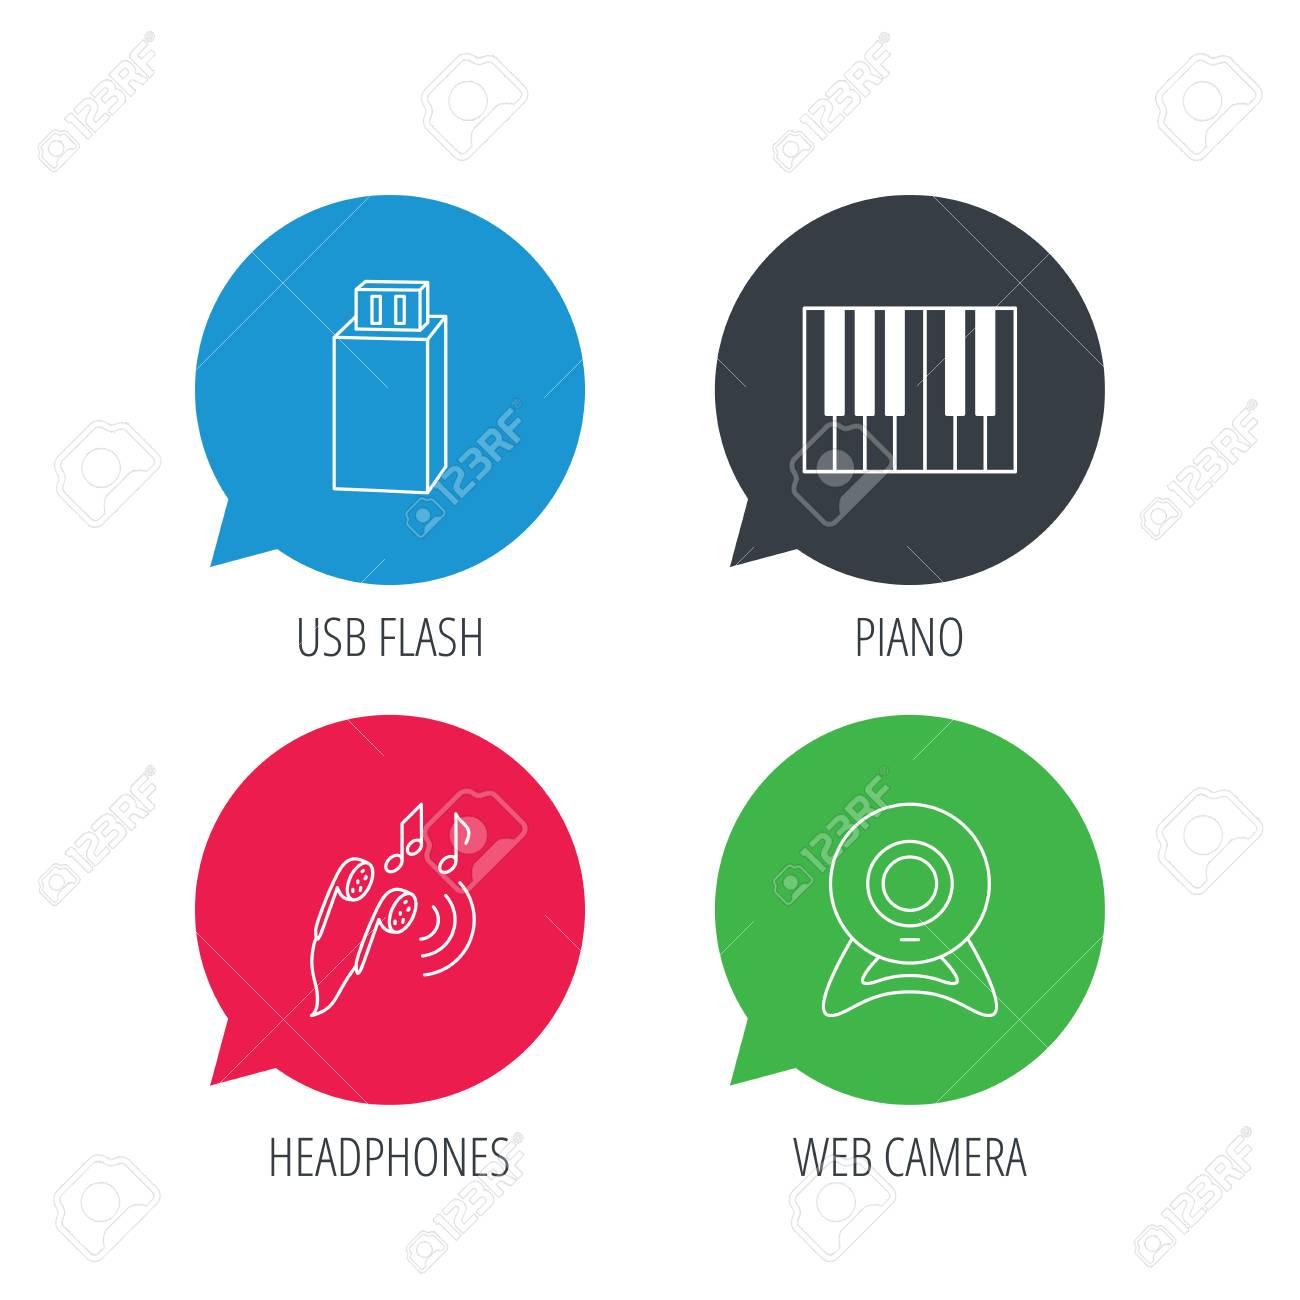 Burbujas De Discurso Coloreado Auriculares Cámara Web E Iconos Flash Usb Piano Signo Lineal Botones Web Planos Con Iconos Lineales Vector